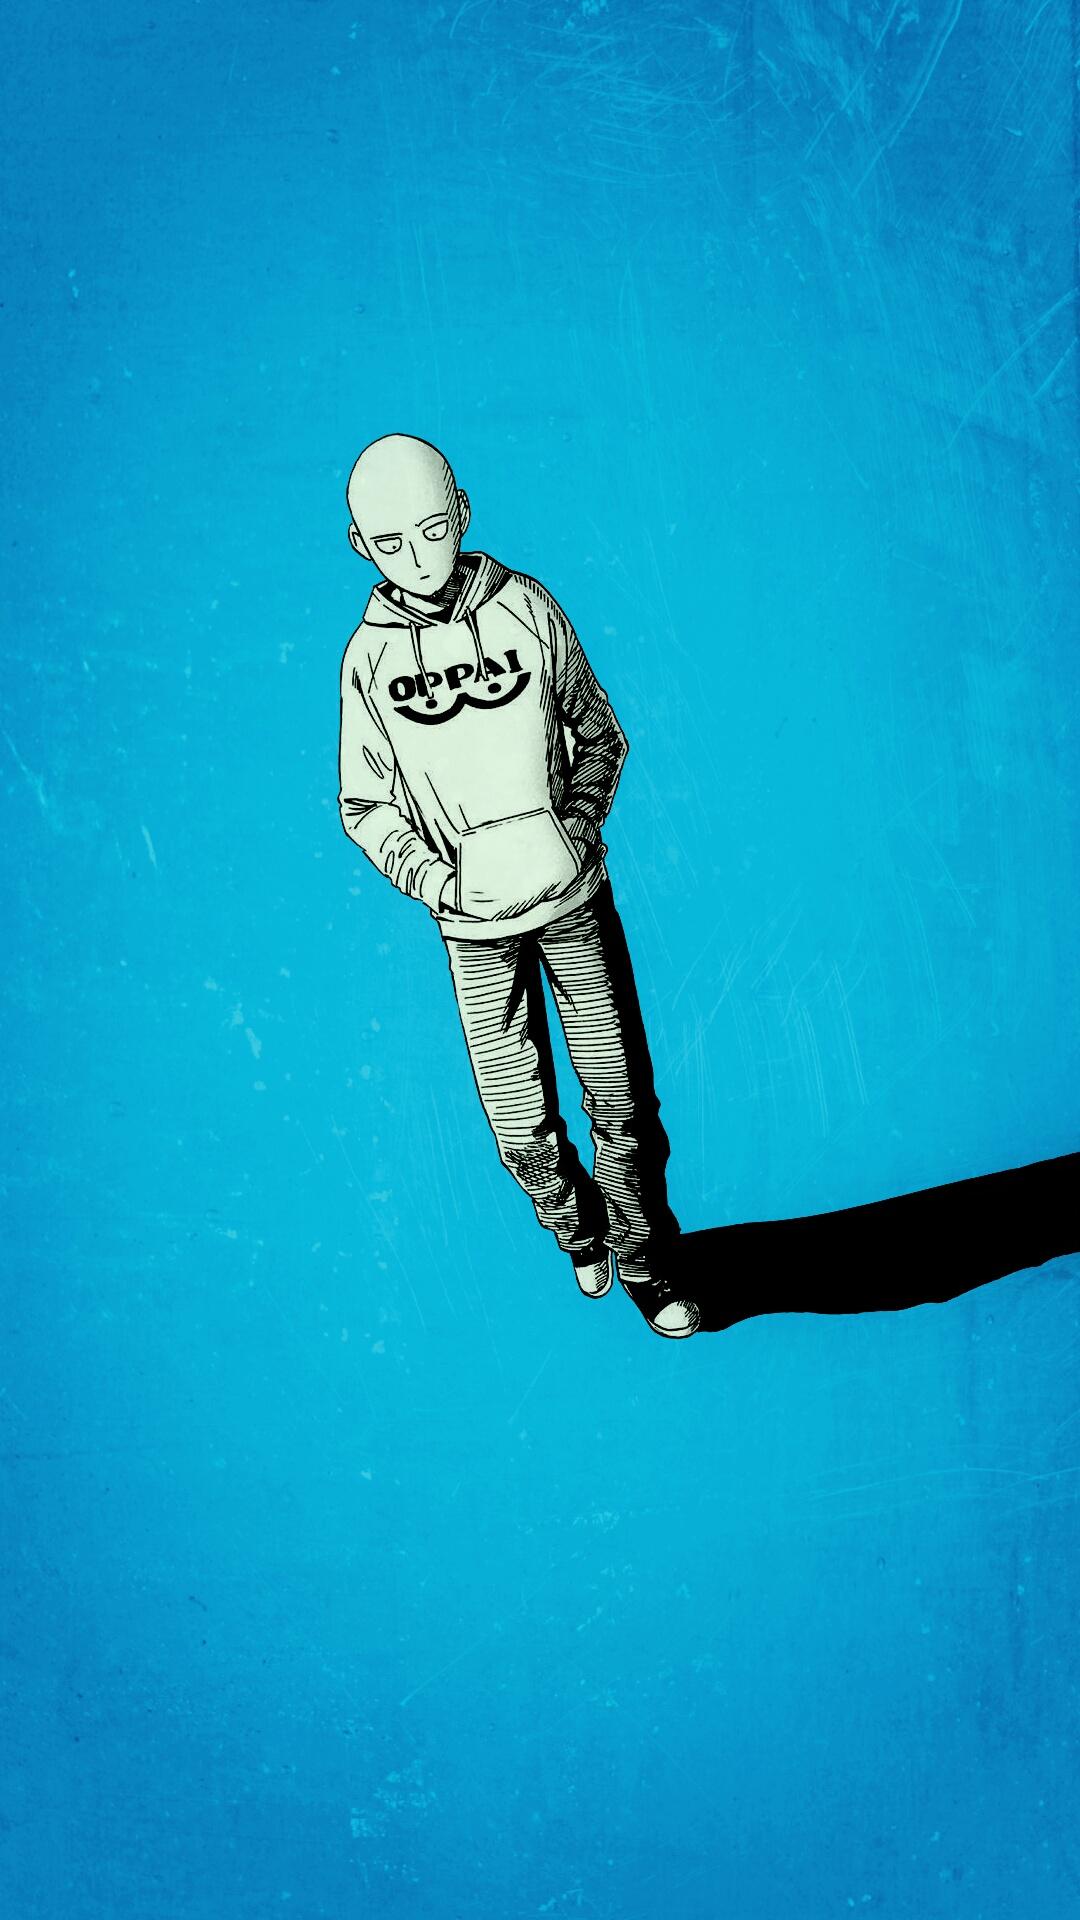 One Punch Saitama Images - Wallpaper : Saitama, One Punch Man, minimalism 1080x1920 ...